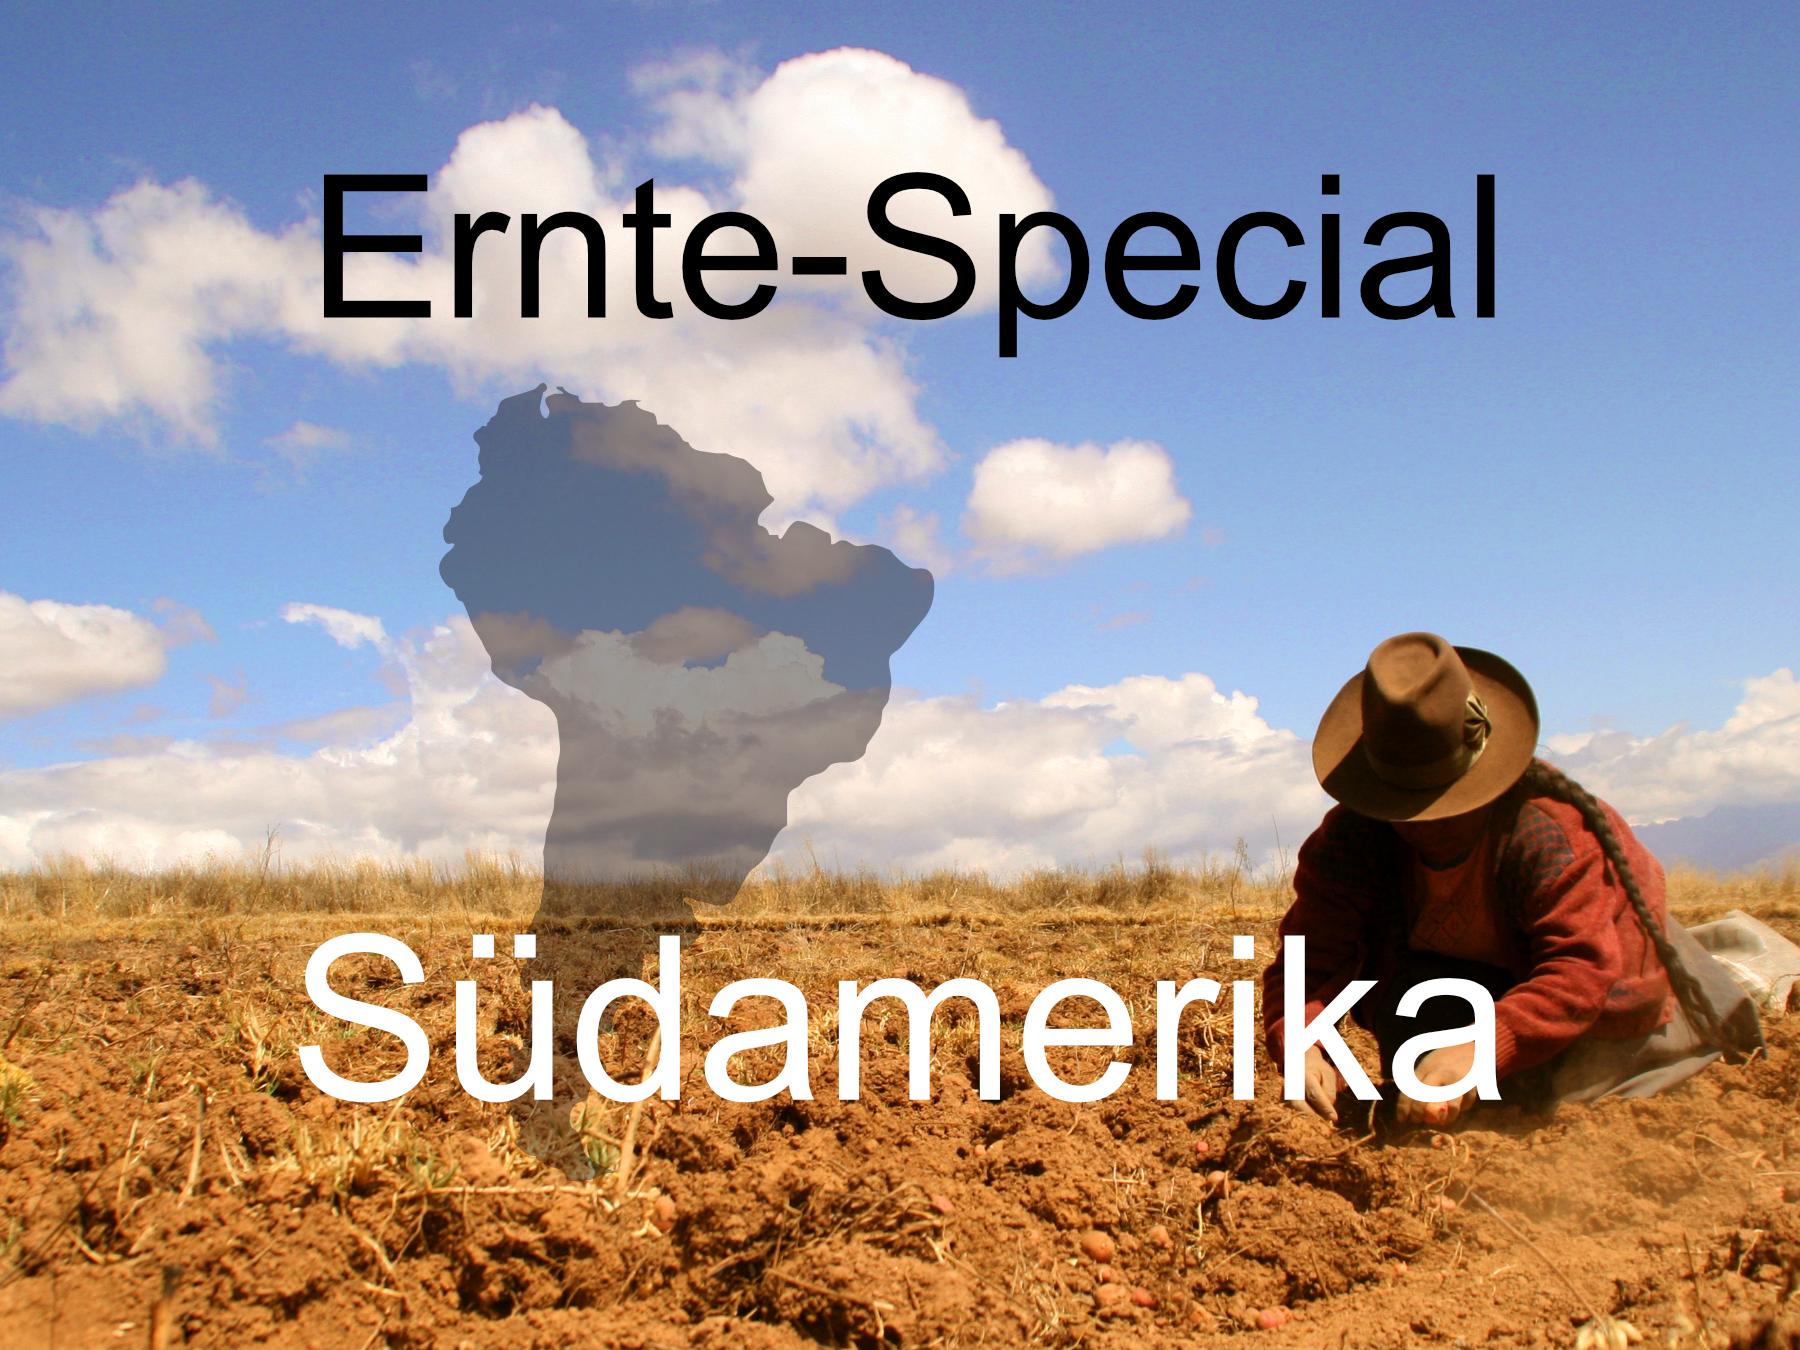 Blog-Bild-Ernte-Special-Sudamerika